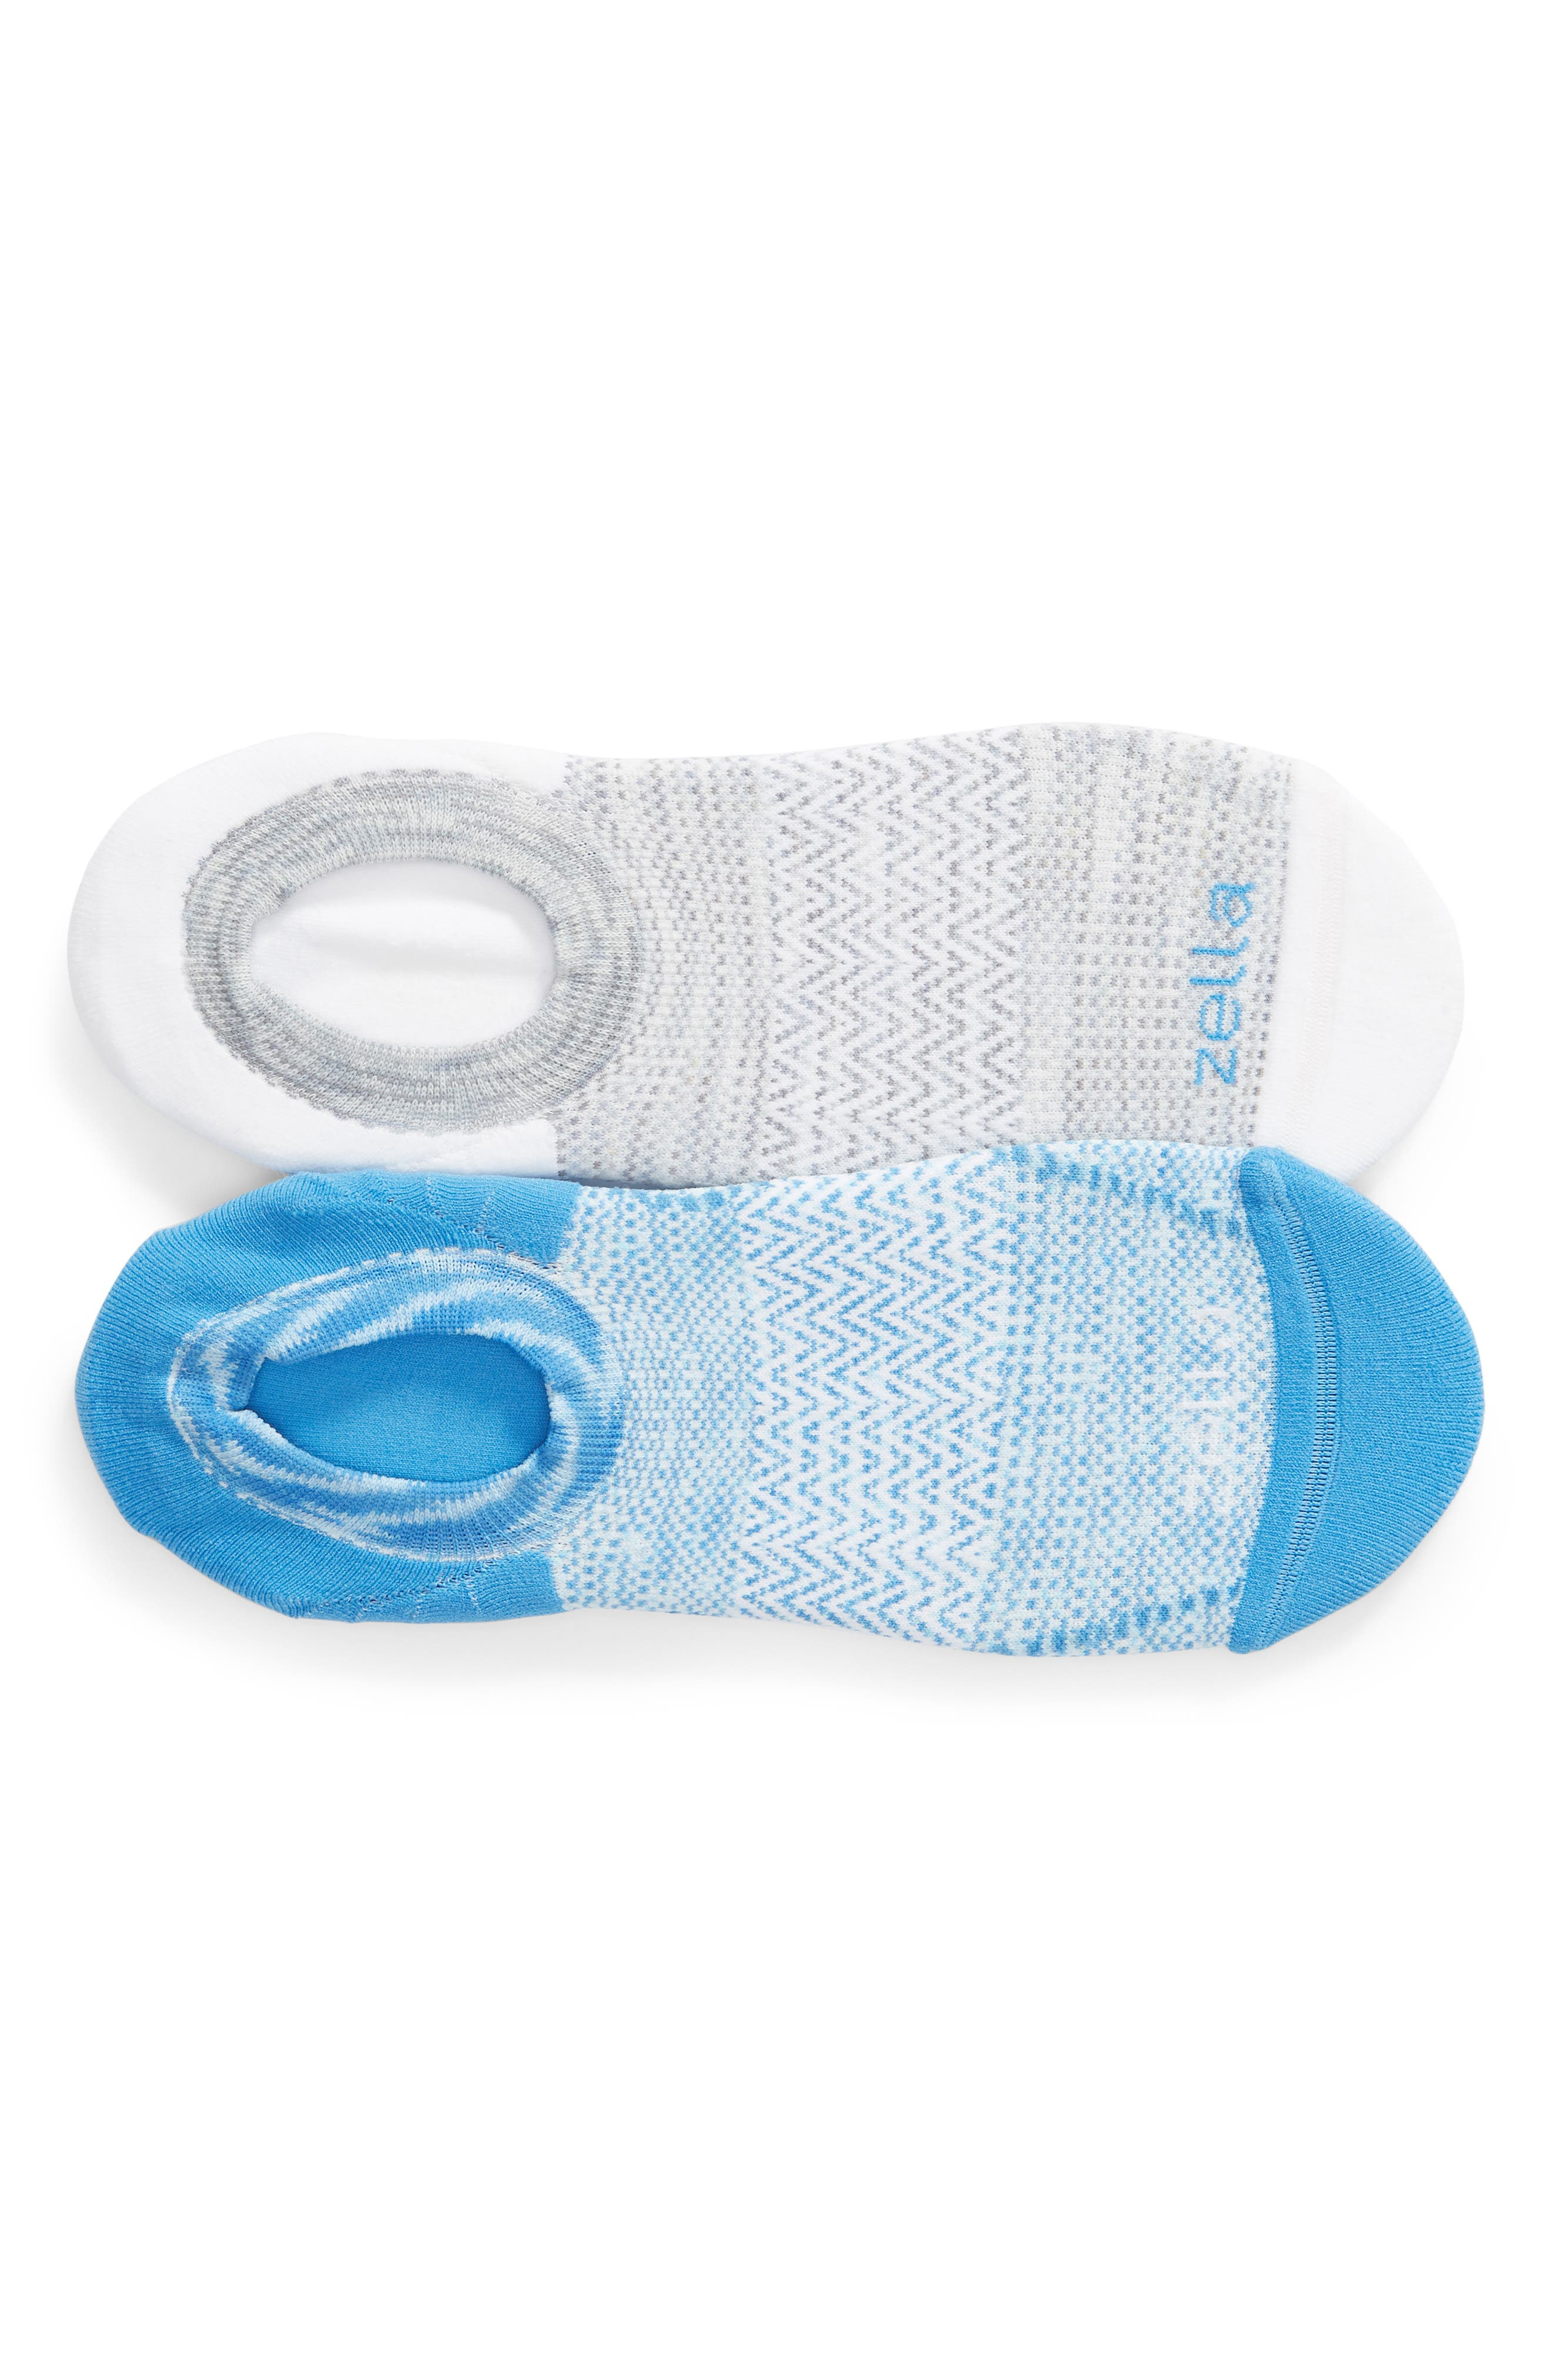 Ultra Light Run 2-Pack Socks,                         Main,                         color, BLUE CAMP